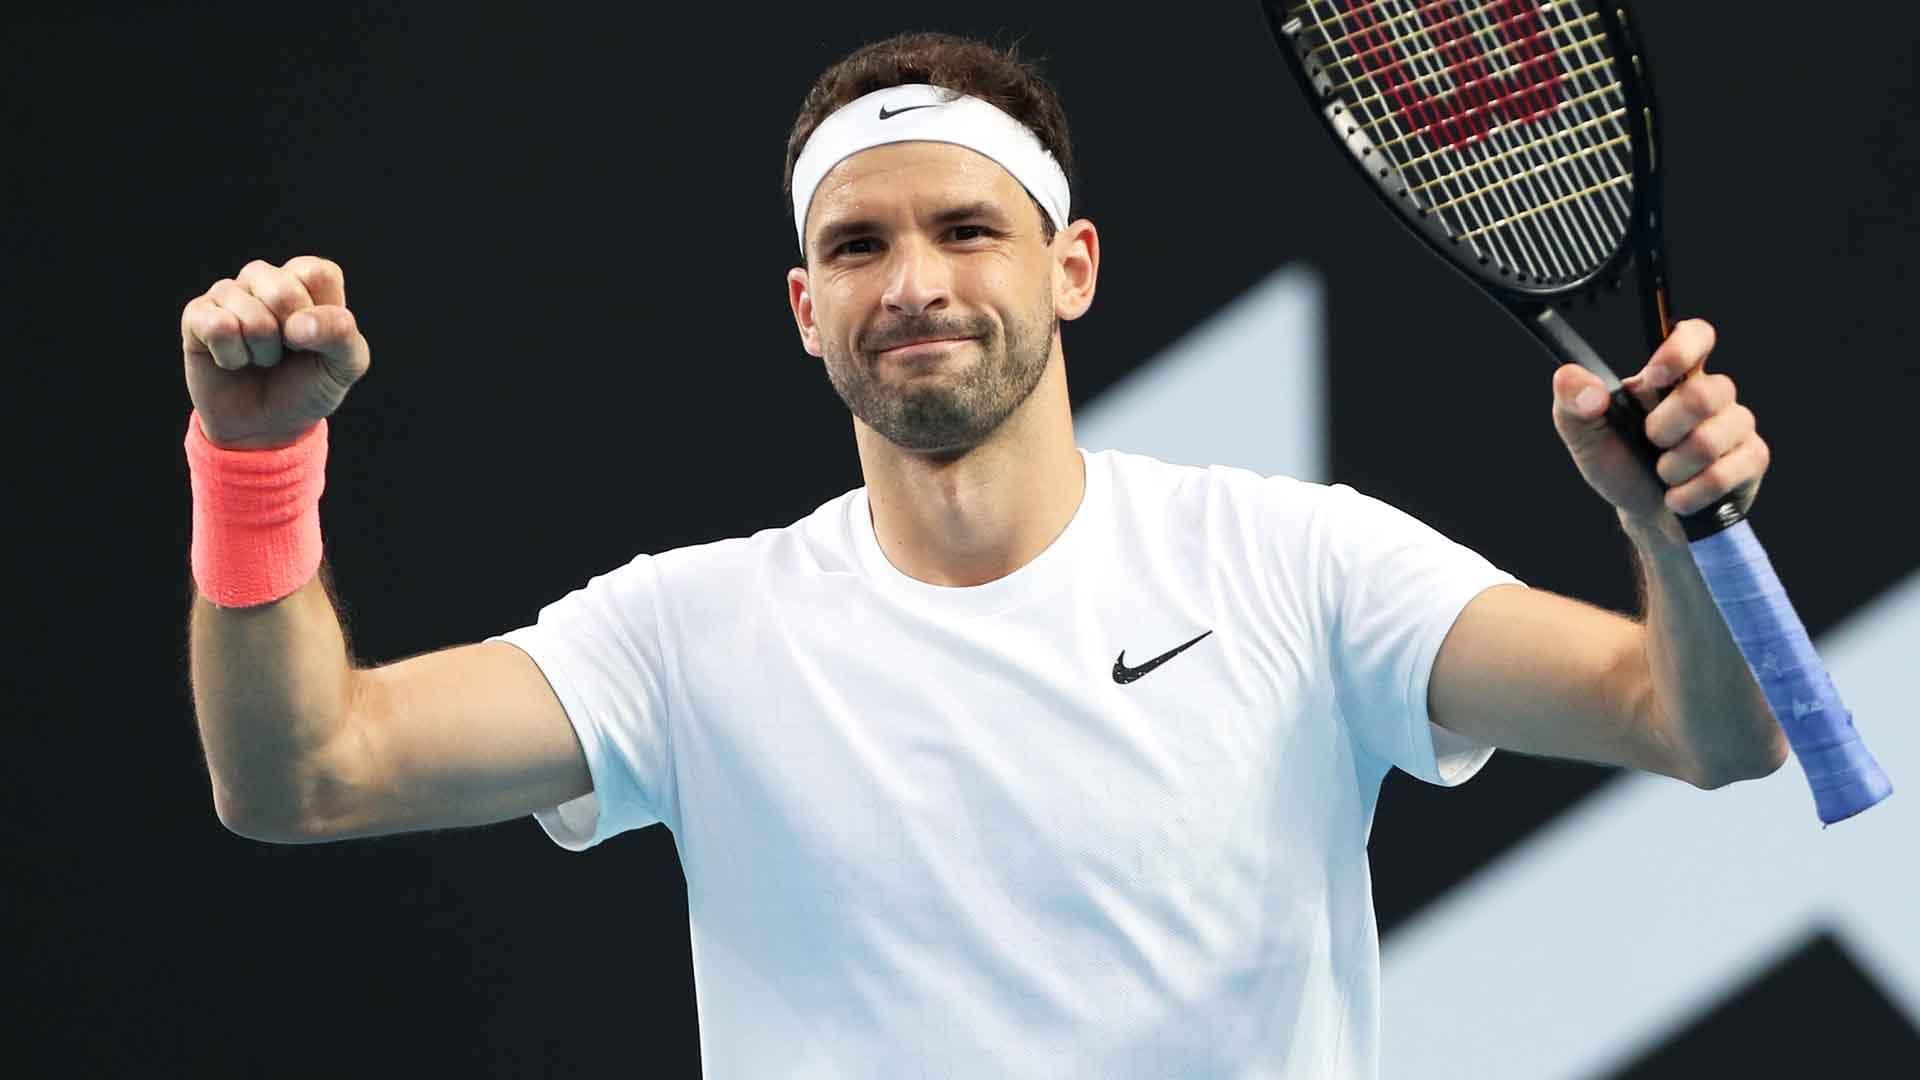 Miami Open 2021: Grigor Dimitrov vs. Cameron Norrie Tennis Pick and Prediction